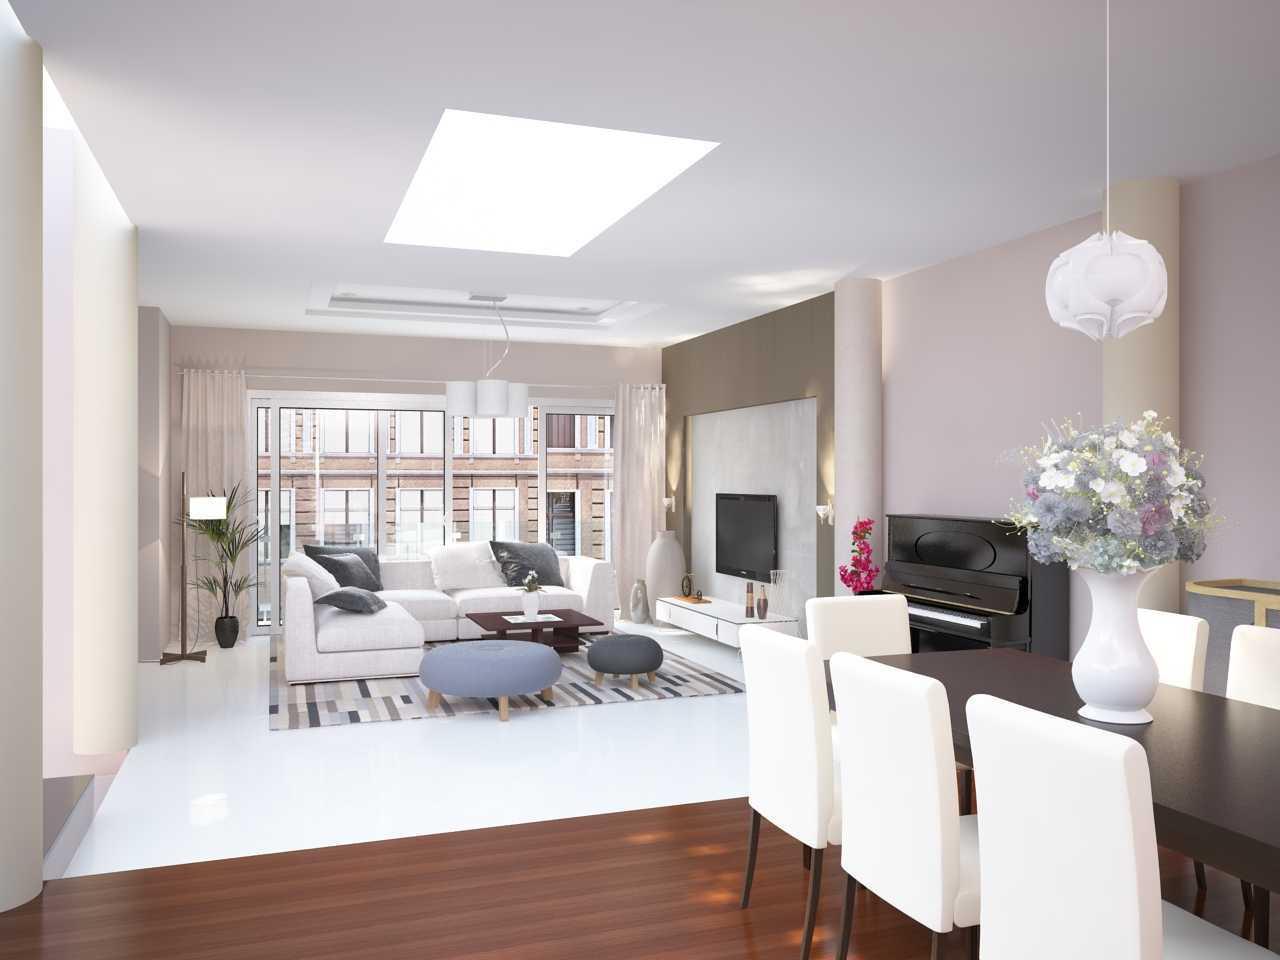 Hive Design & Build Pantai Indah Kapuk Residence Jakarta Jakarta 3Dinteriorrezalivingroomv2  26564